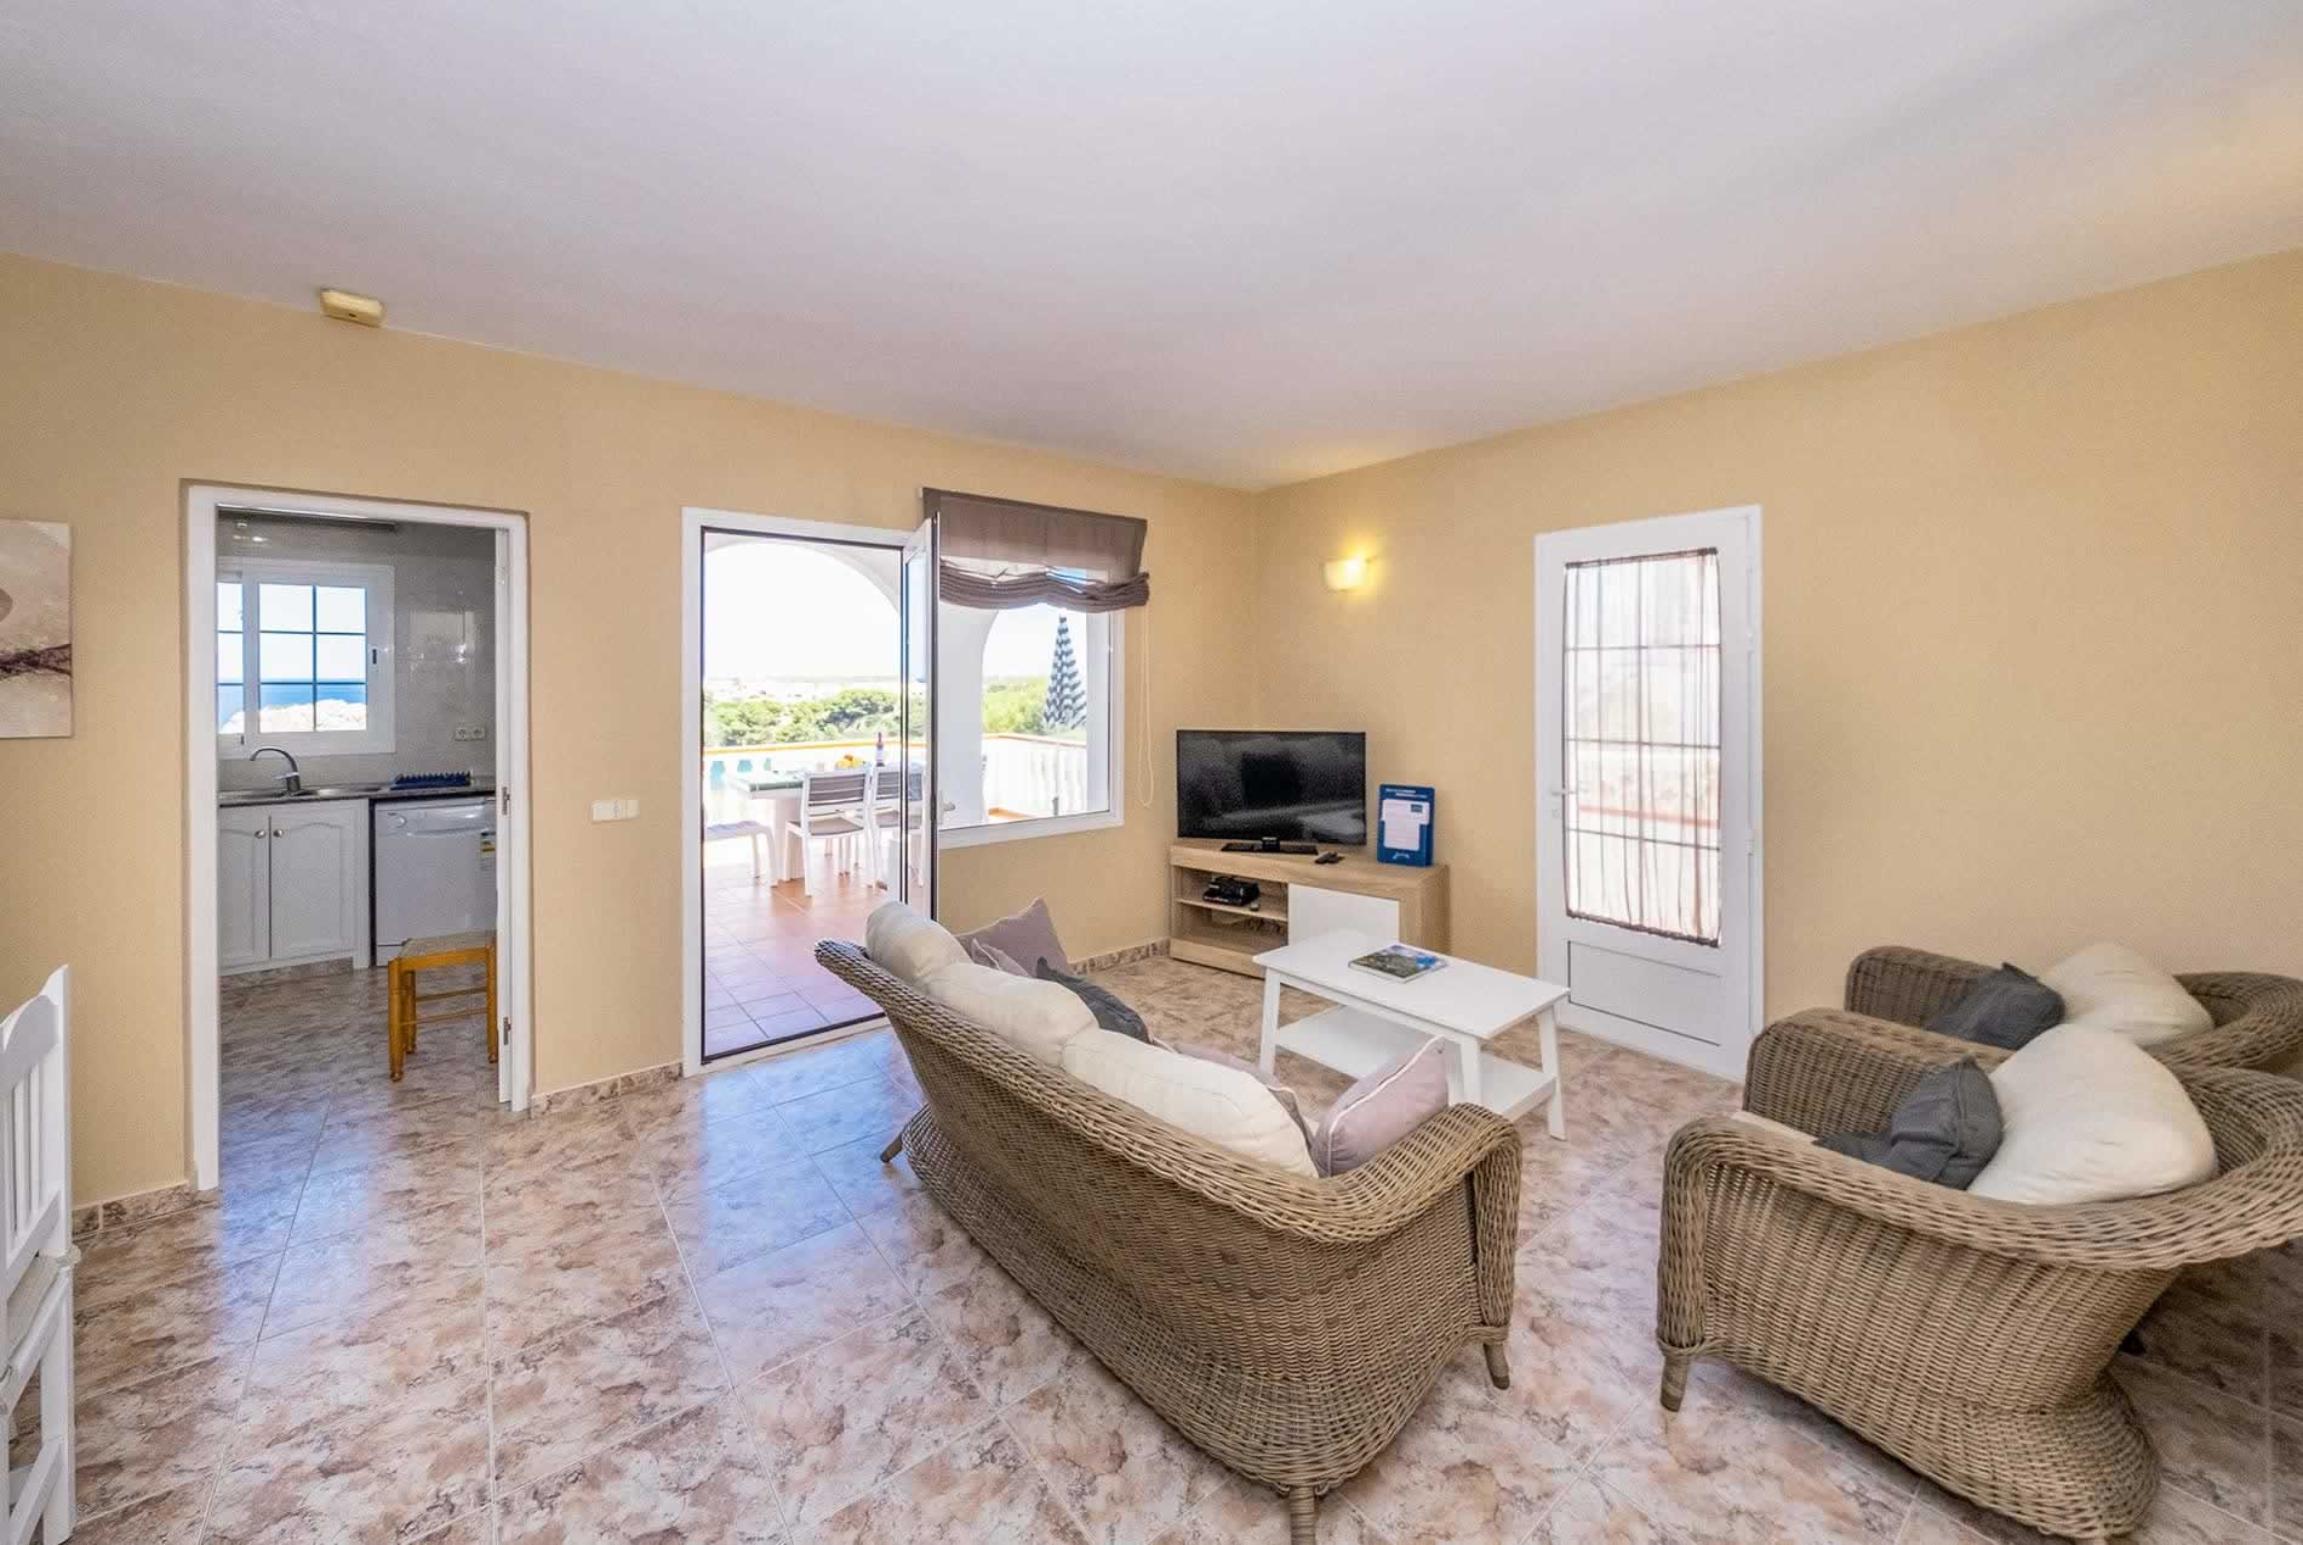 Ferienhaus Bellavista II (2654270), Arenal De'N Castell, Menorca, Balearische Inseln, Spanien, Bild 35